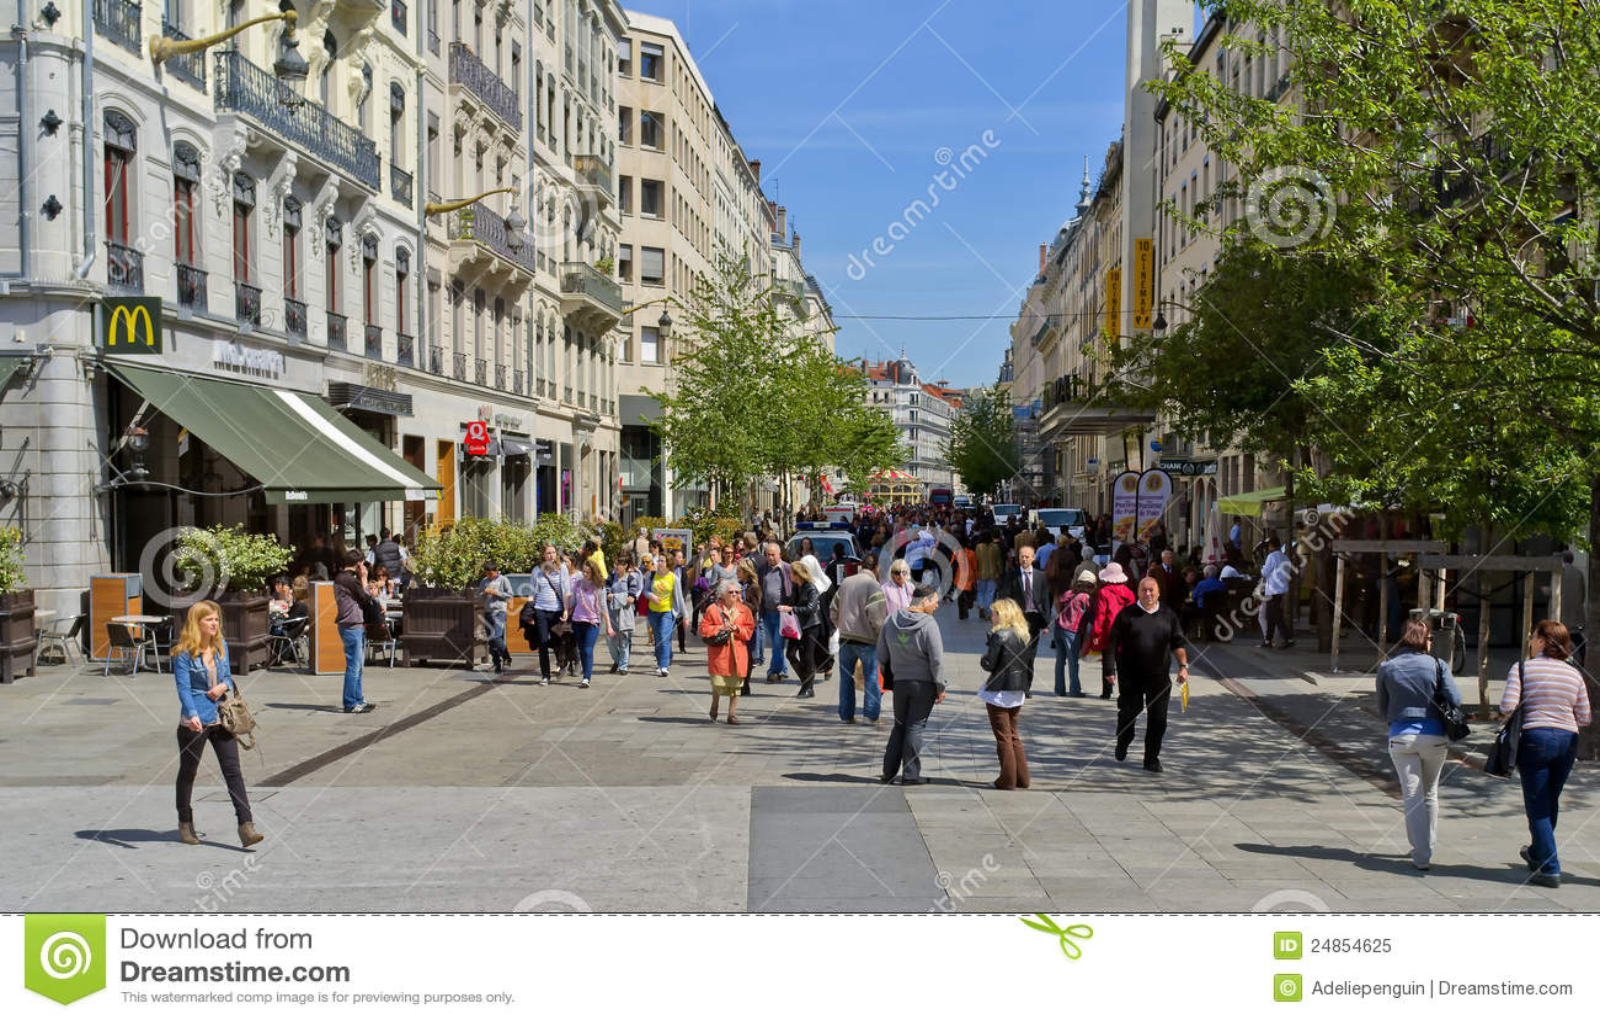 Shopping in Lyon - World Travel Guide